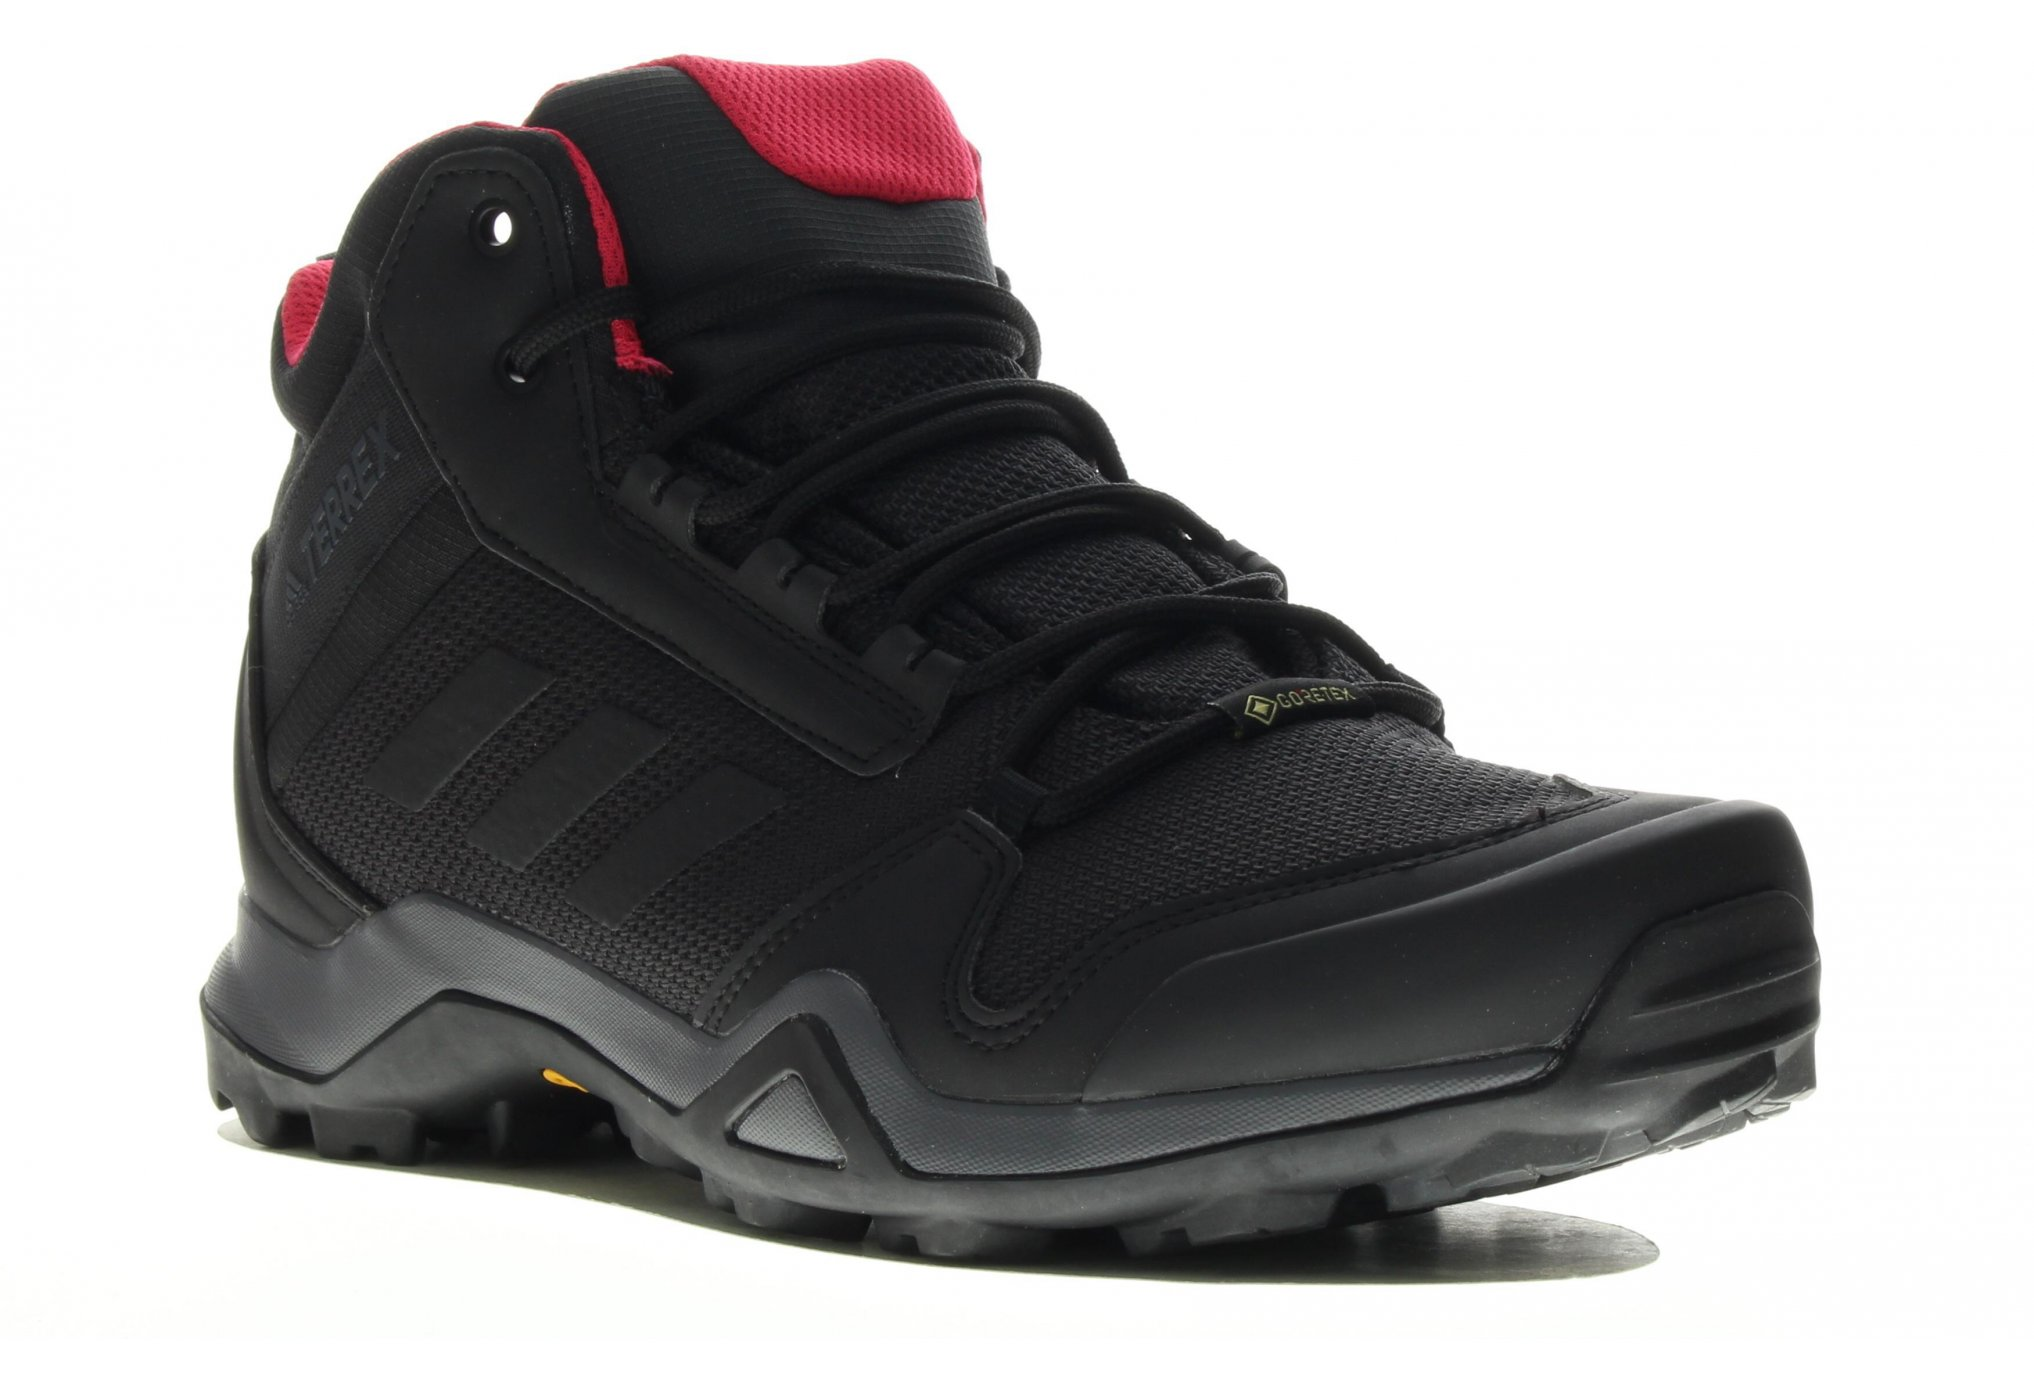 adidas Terrex AX3 Mid Gore-Tex W Diététique Chaussures femme